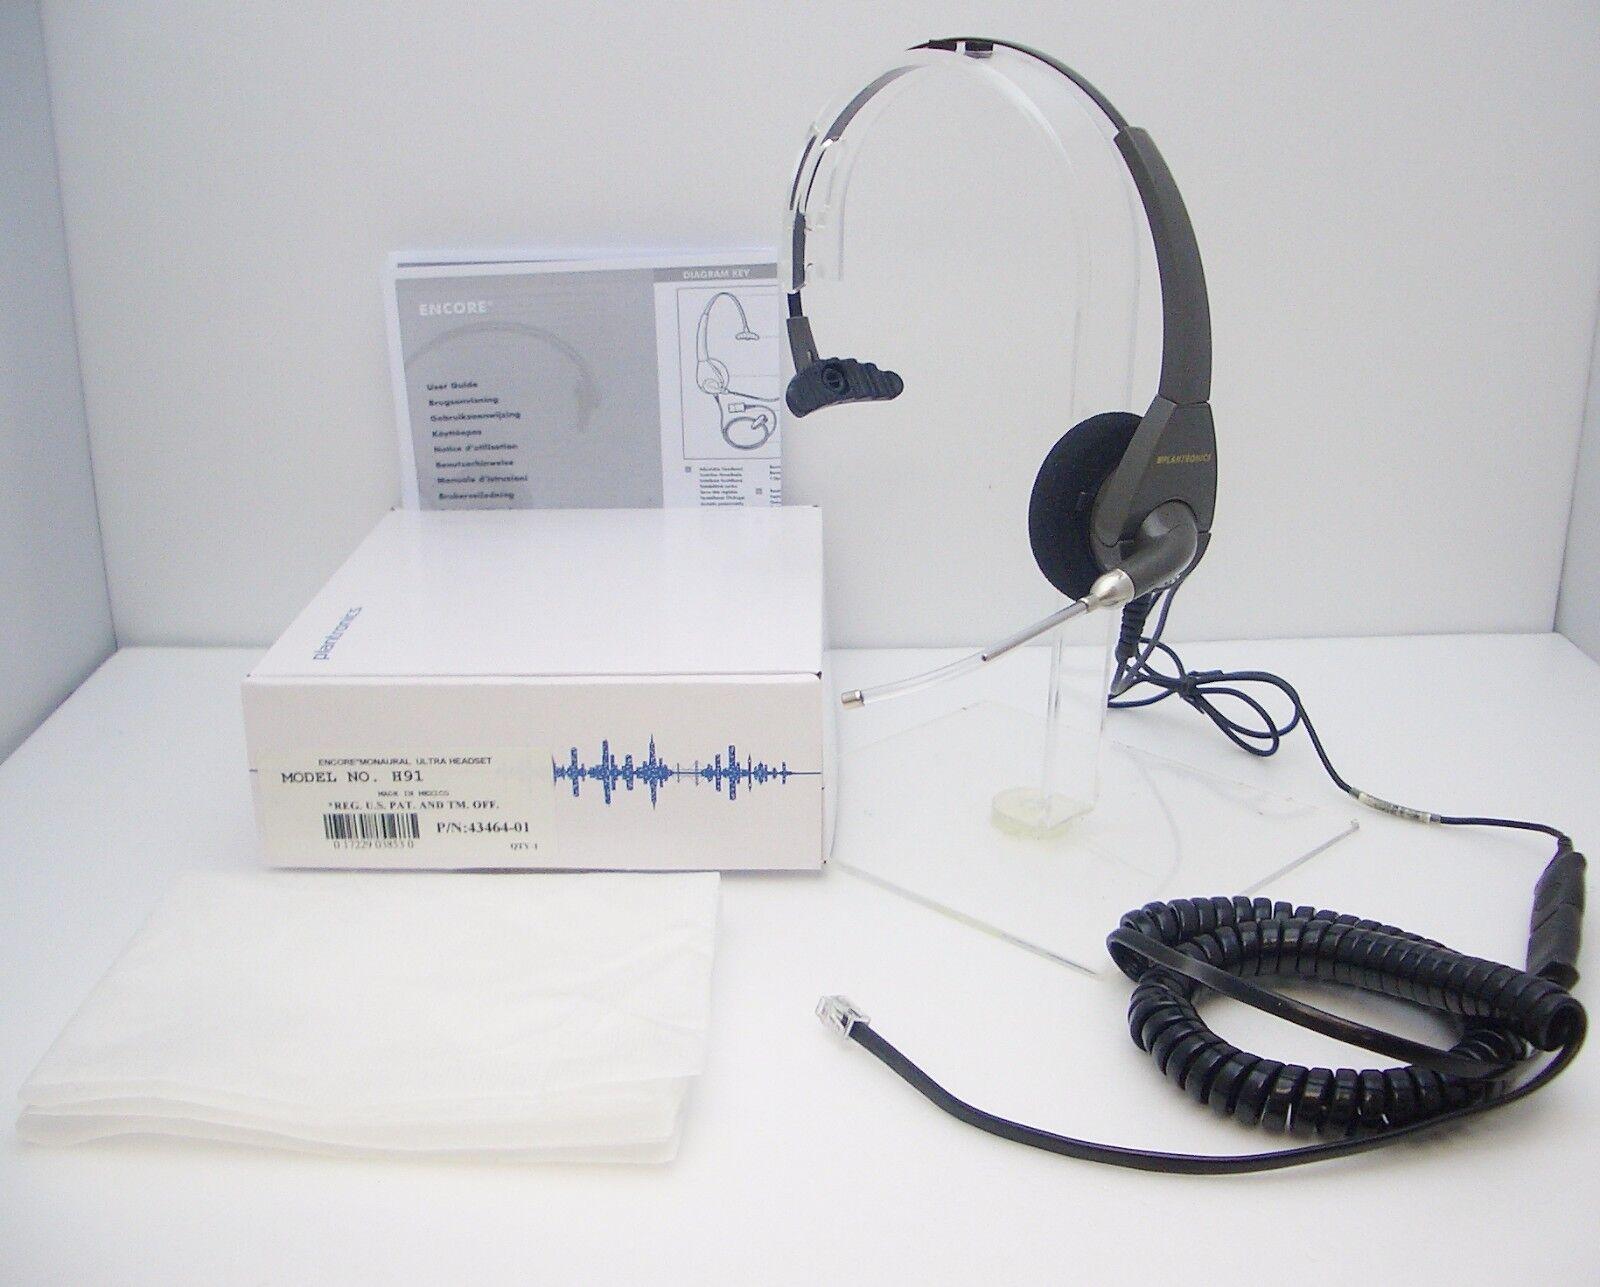 HW121N-BB Headset for Cisco 7841 7961 7965 7970 7971 7975 7985 8941 8945 8961 IP